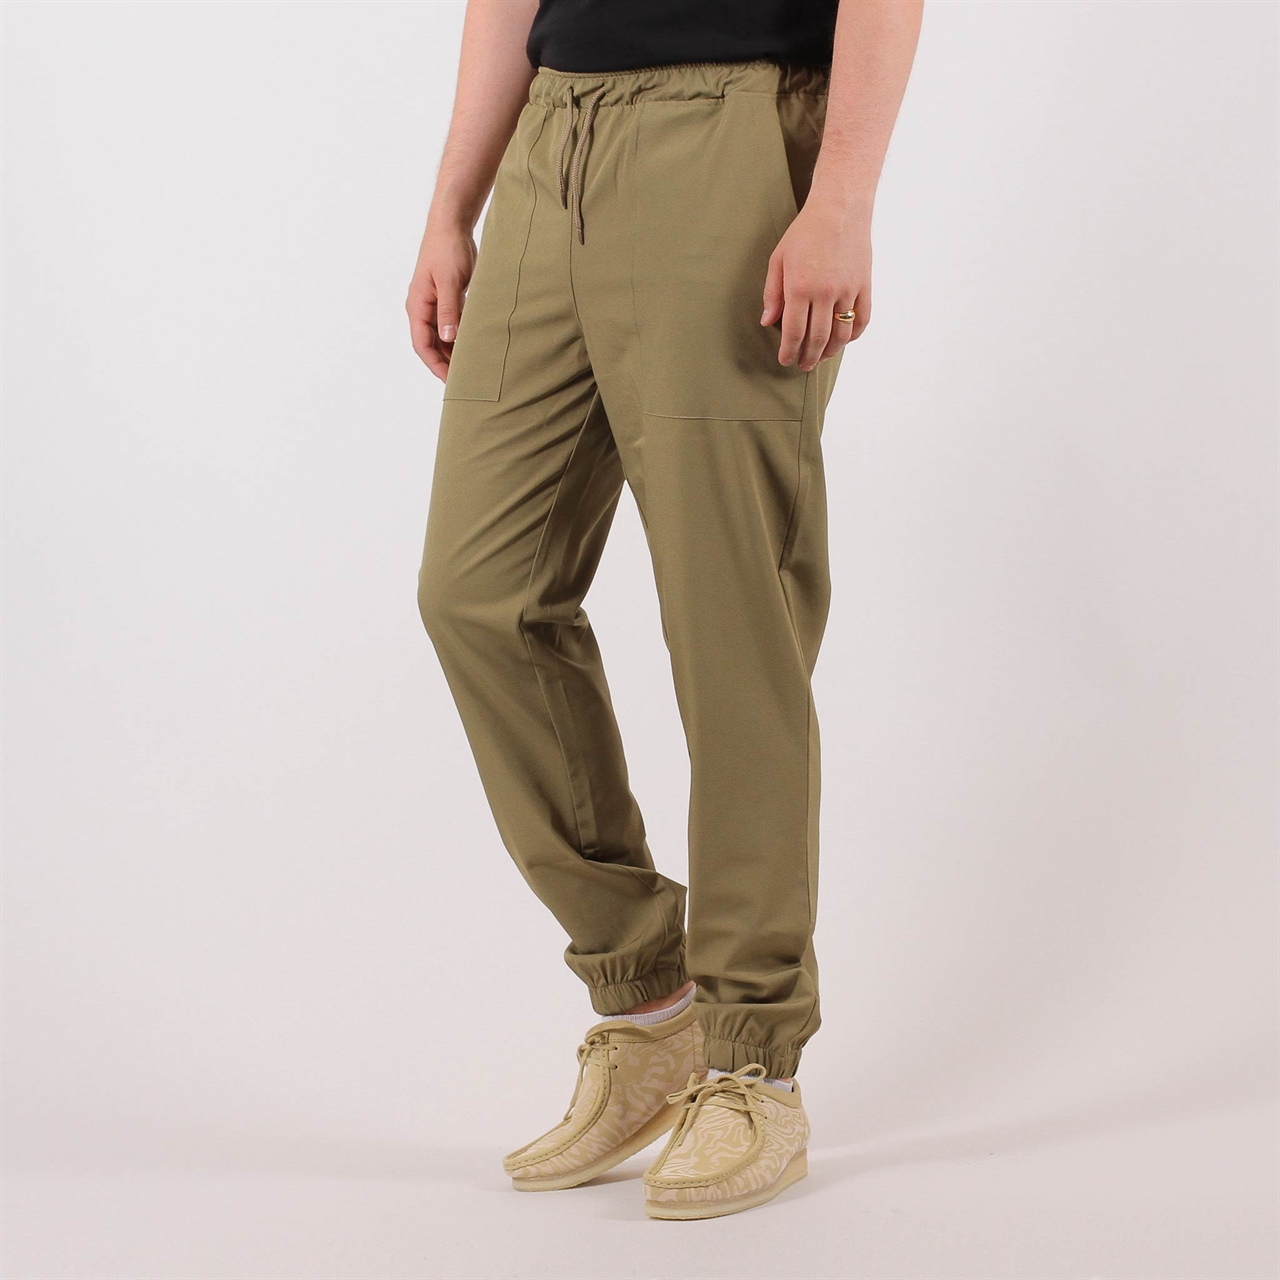 a42b5dc7b50f2b Le Fix Loose Fit Pants Army (18020400600) - Shelta